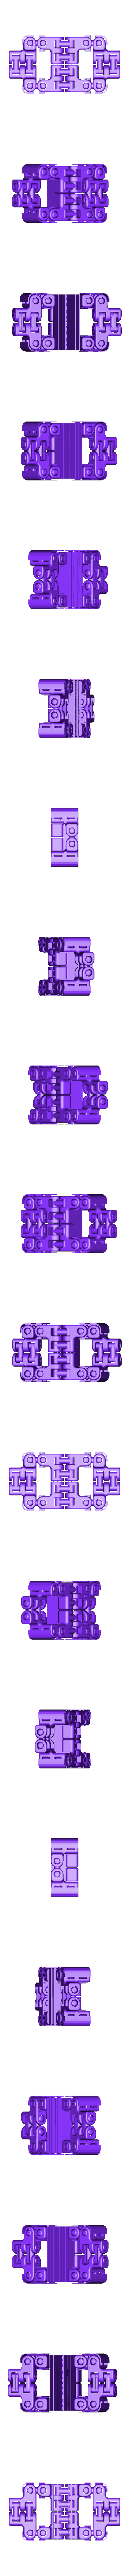 Cube_v3_18mm_Support.stl Télécharger fichier STL gratuit Kobayashy Fidget Cube Simplifié v3 • Objet à imprimer en 3D, SiberK